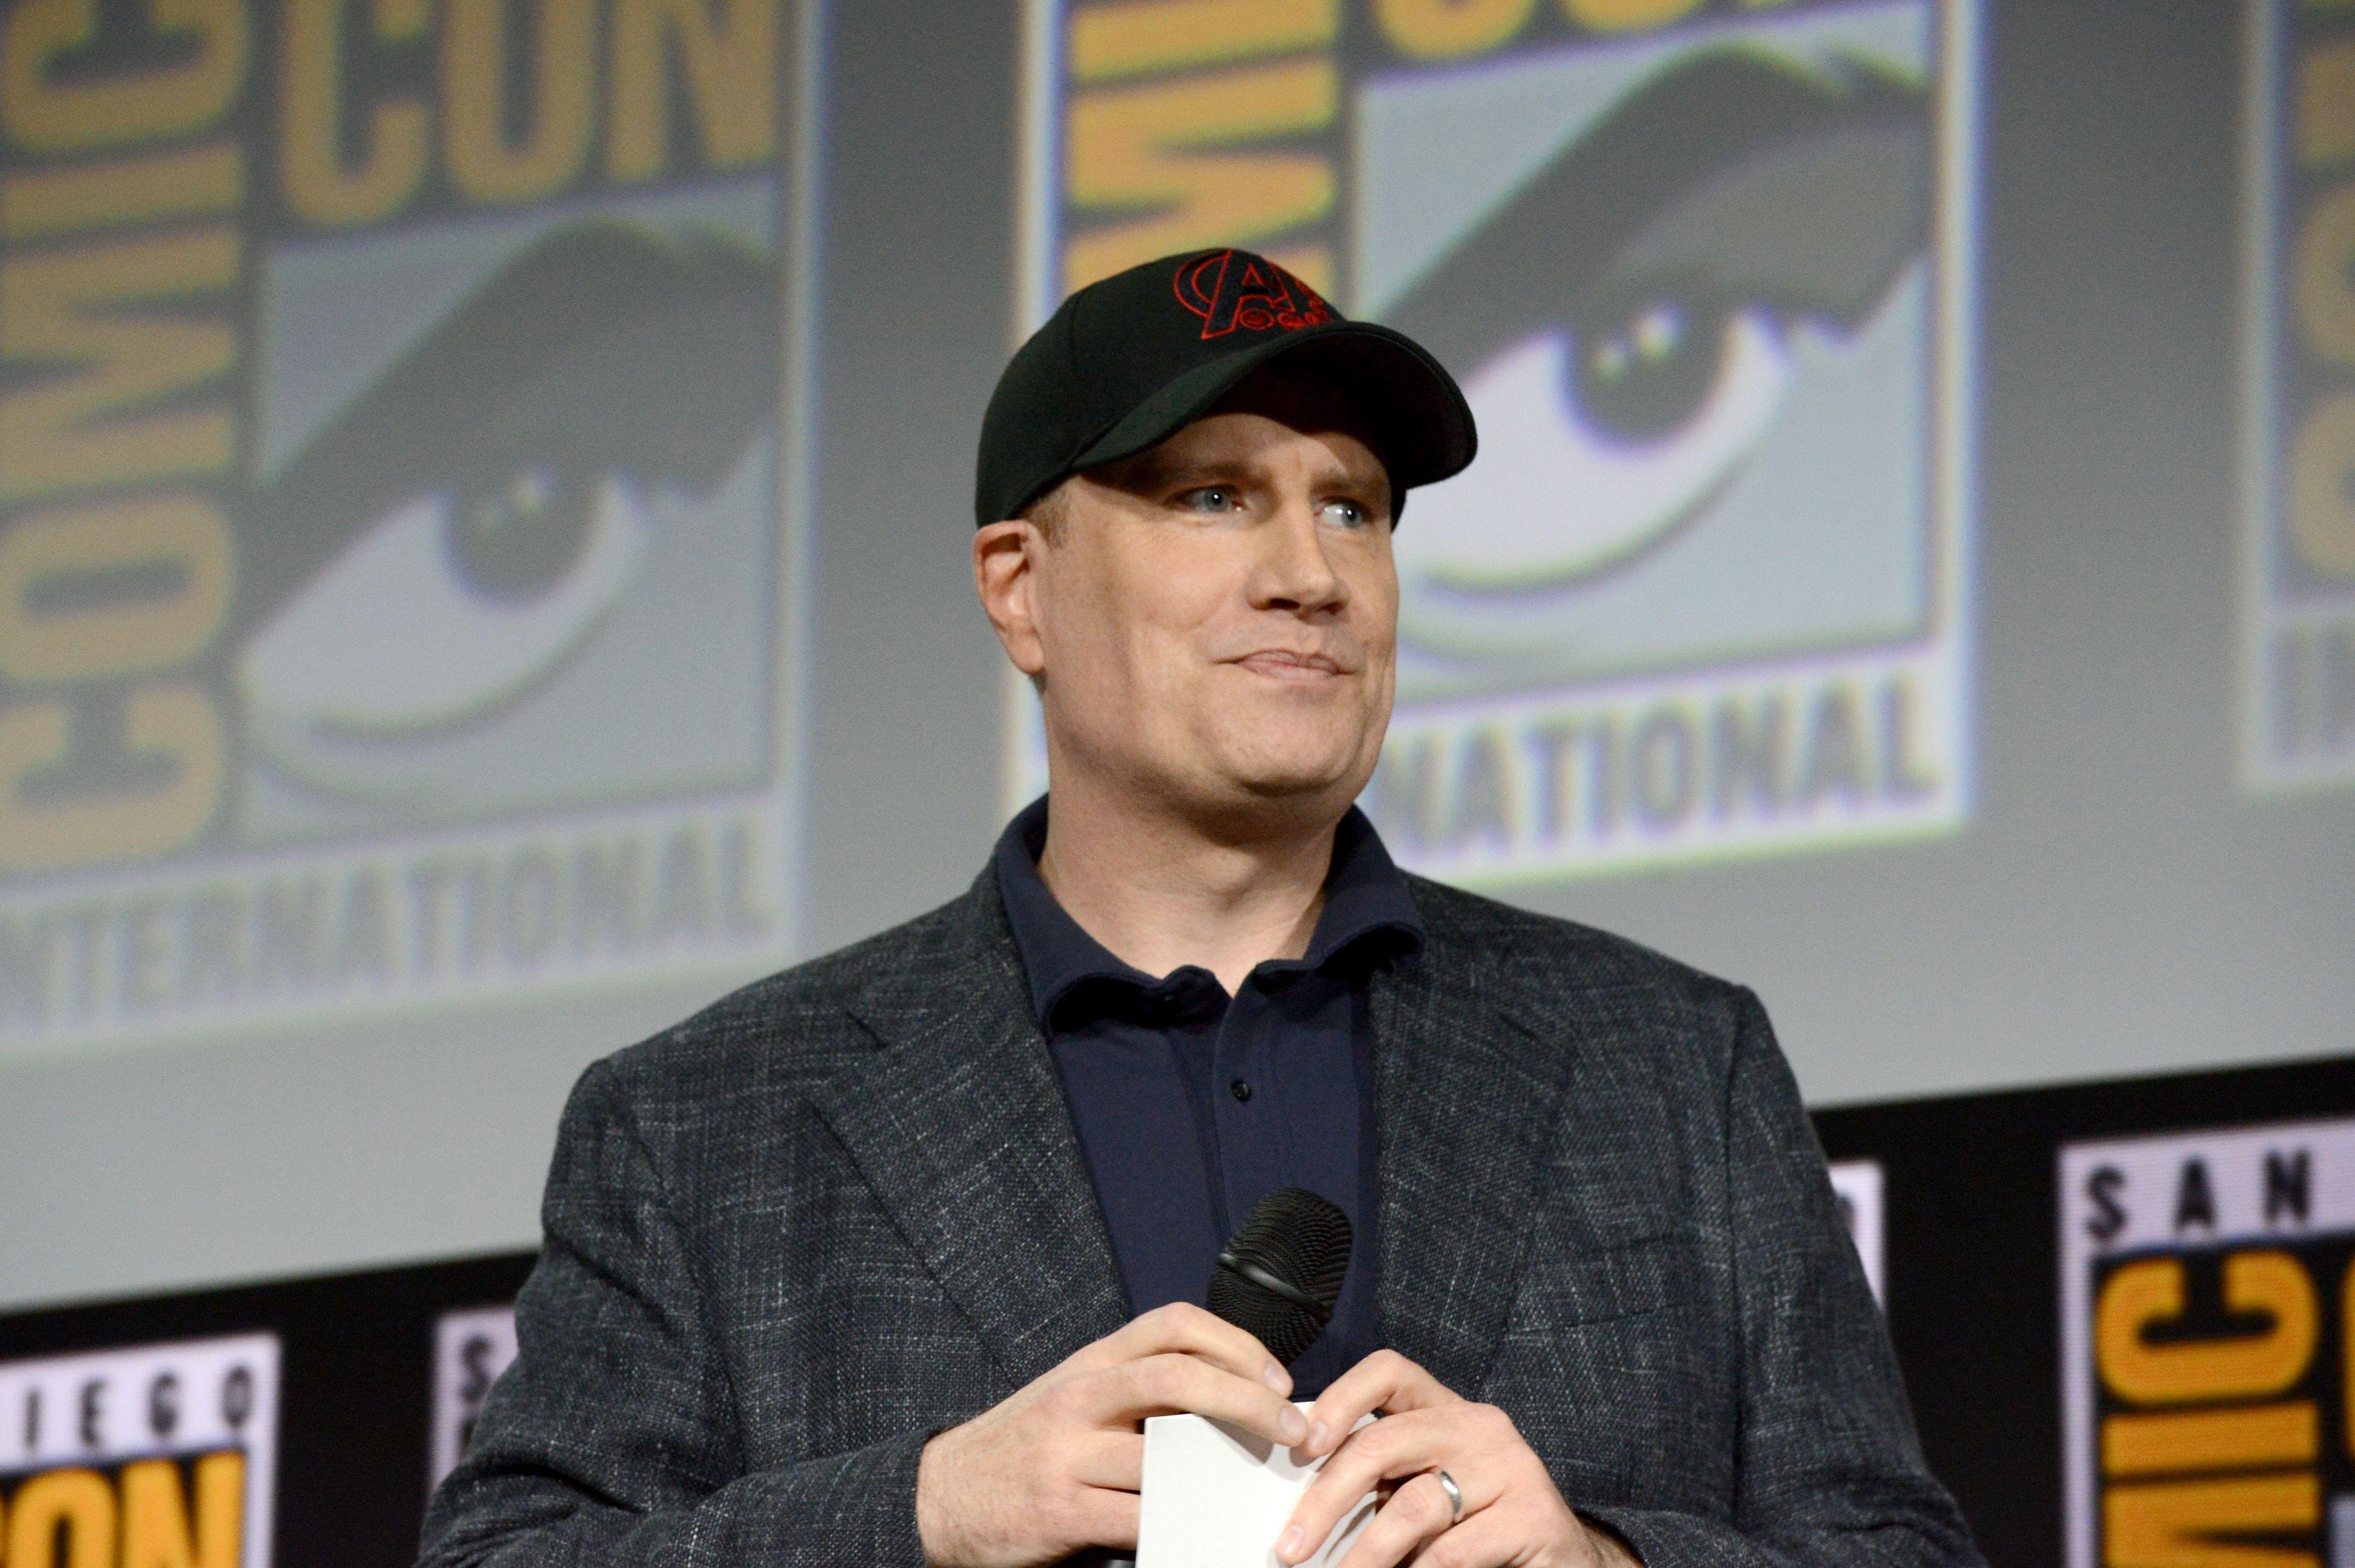 Marvel ya Tiene Fase 5 - Kevin Feige Anuncia Planes para UCM